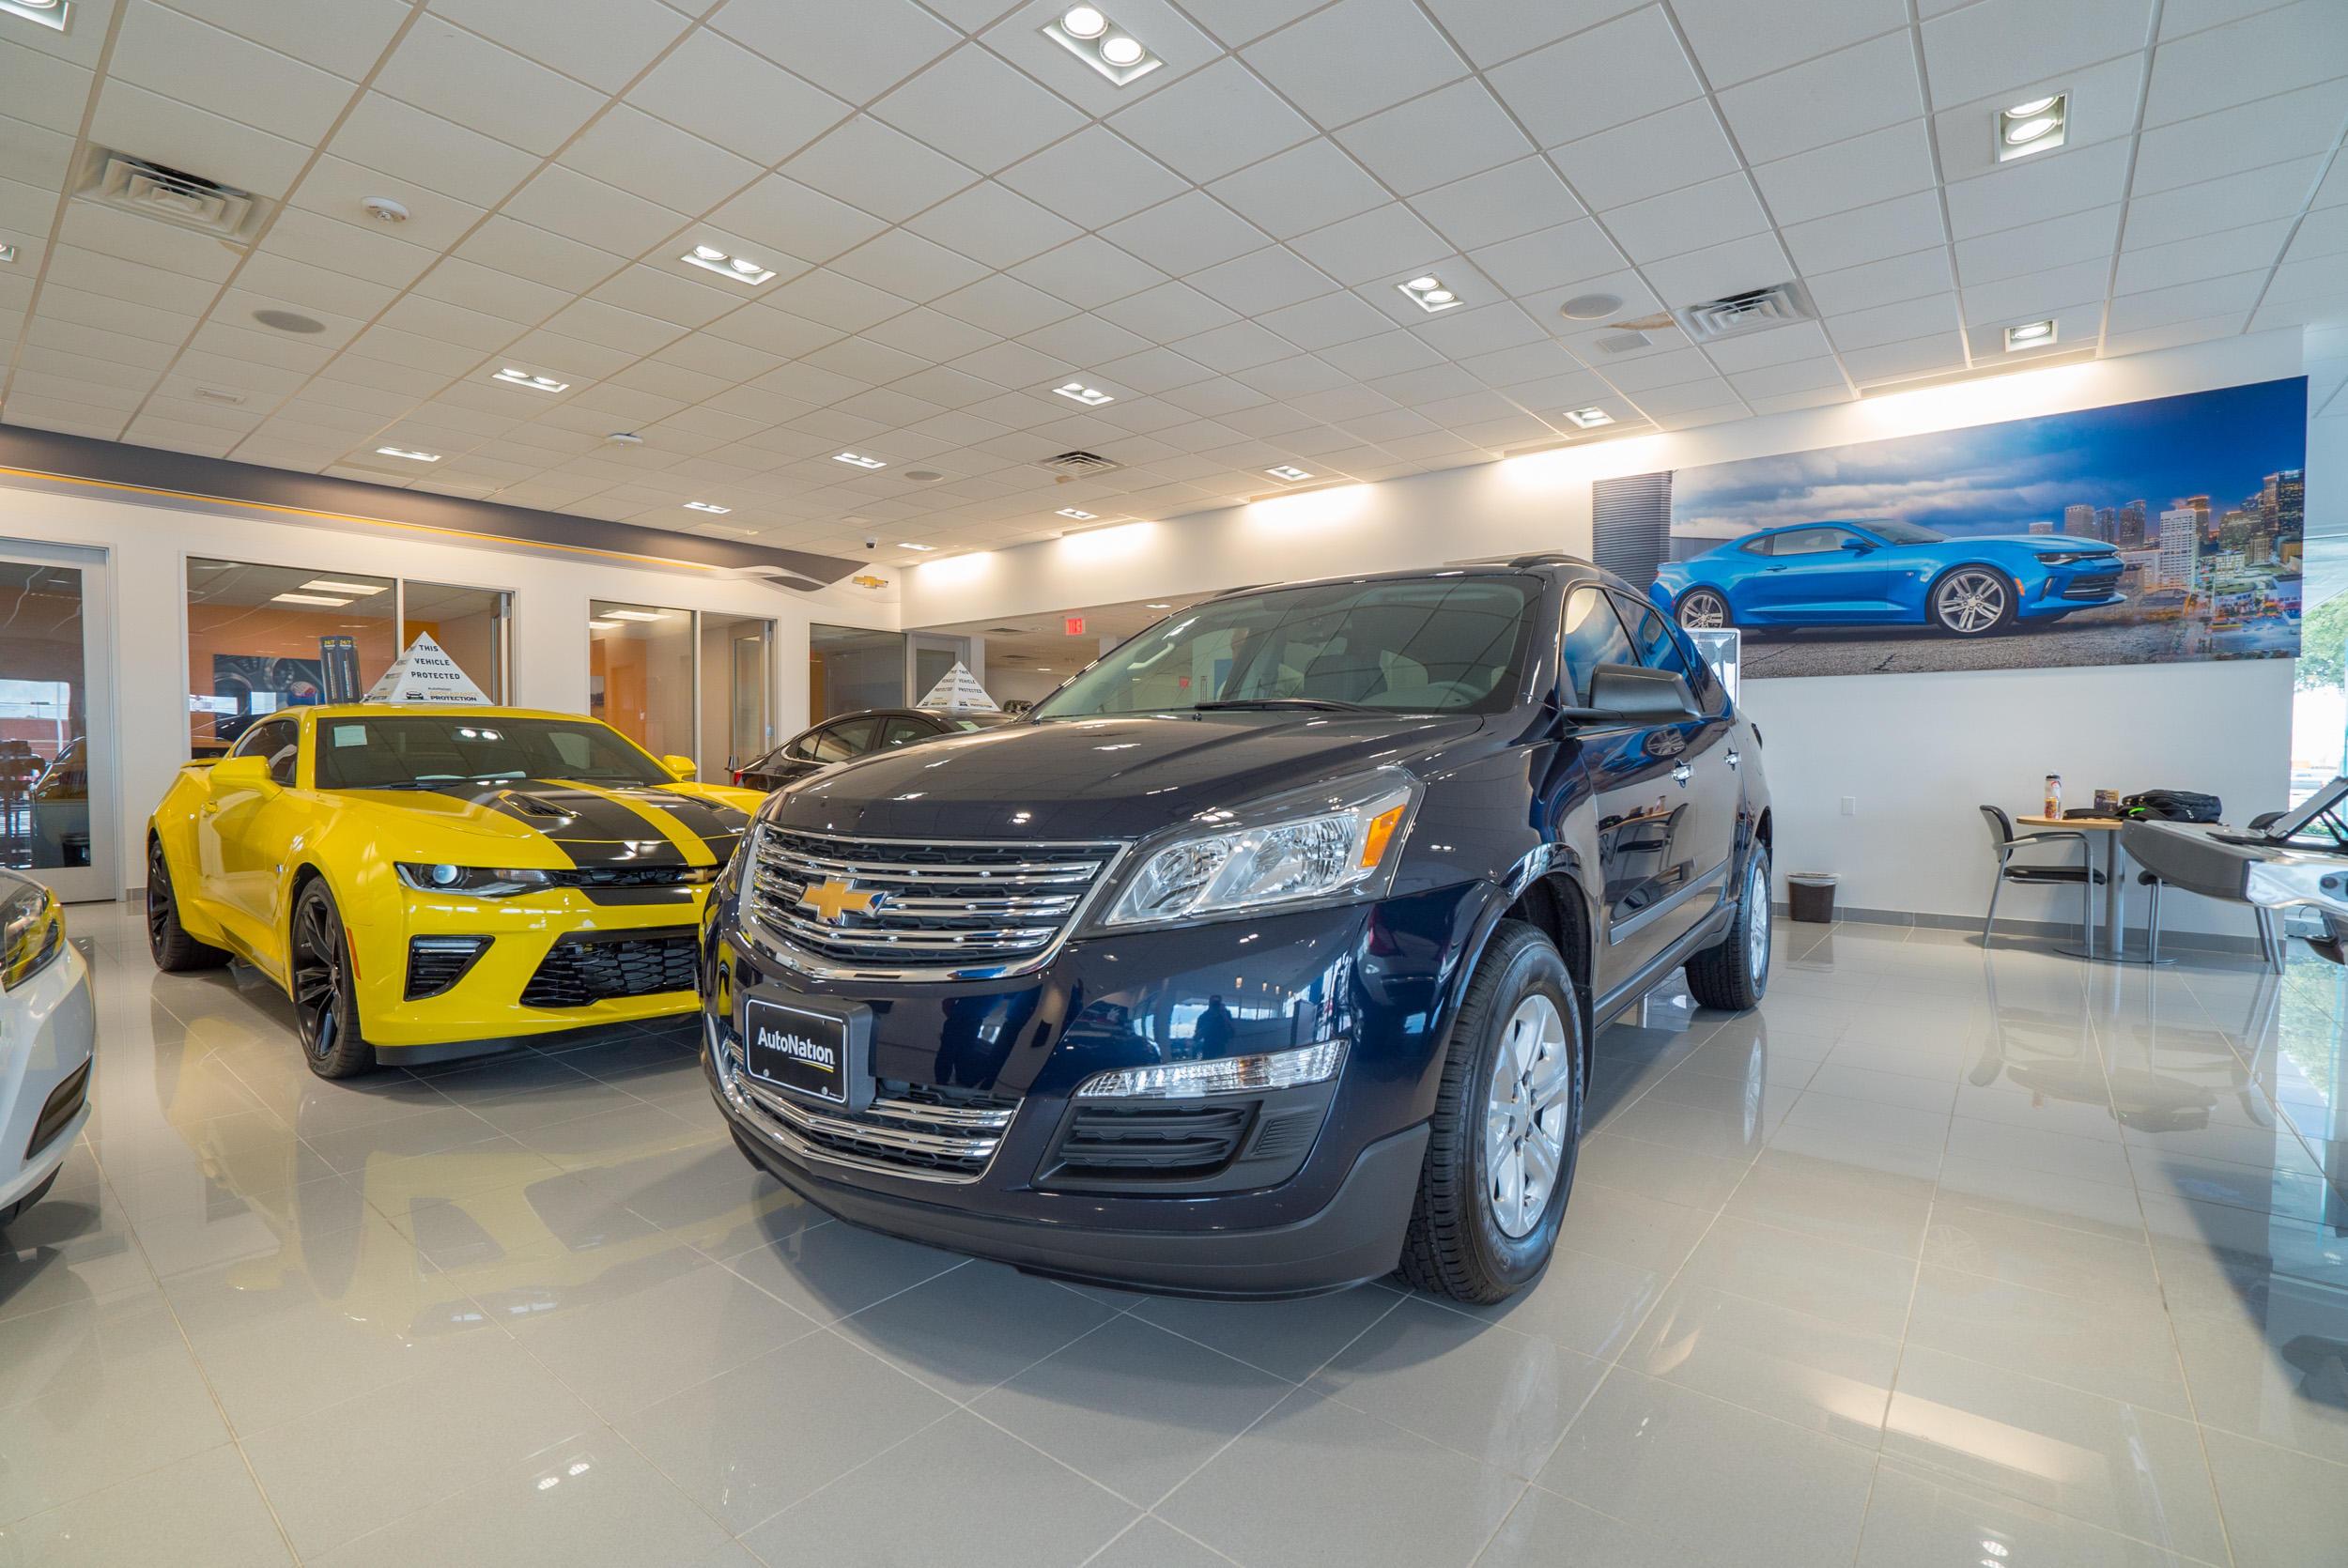 Hertz Car Sales Houston Houston Tx 77094 Car Dealership: AutoNation Chevrolet Highway 6